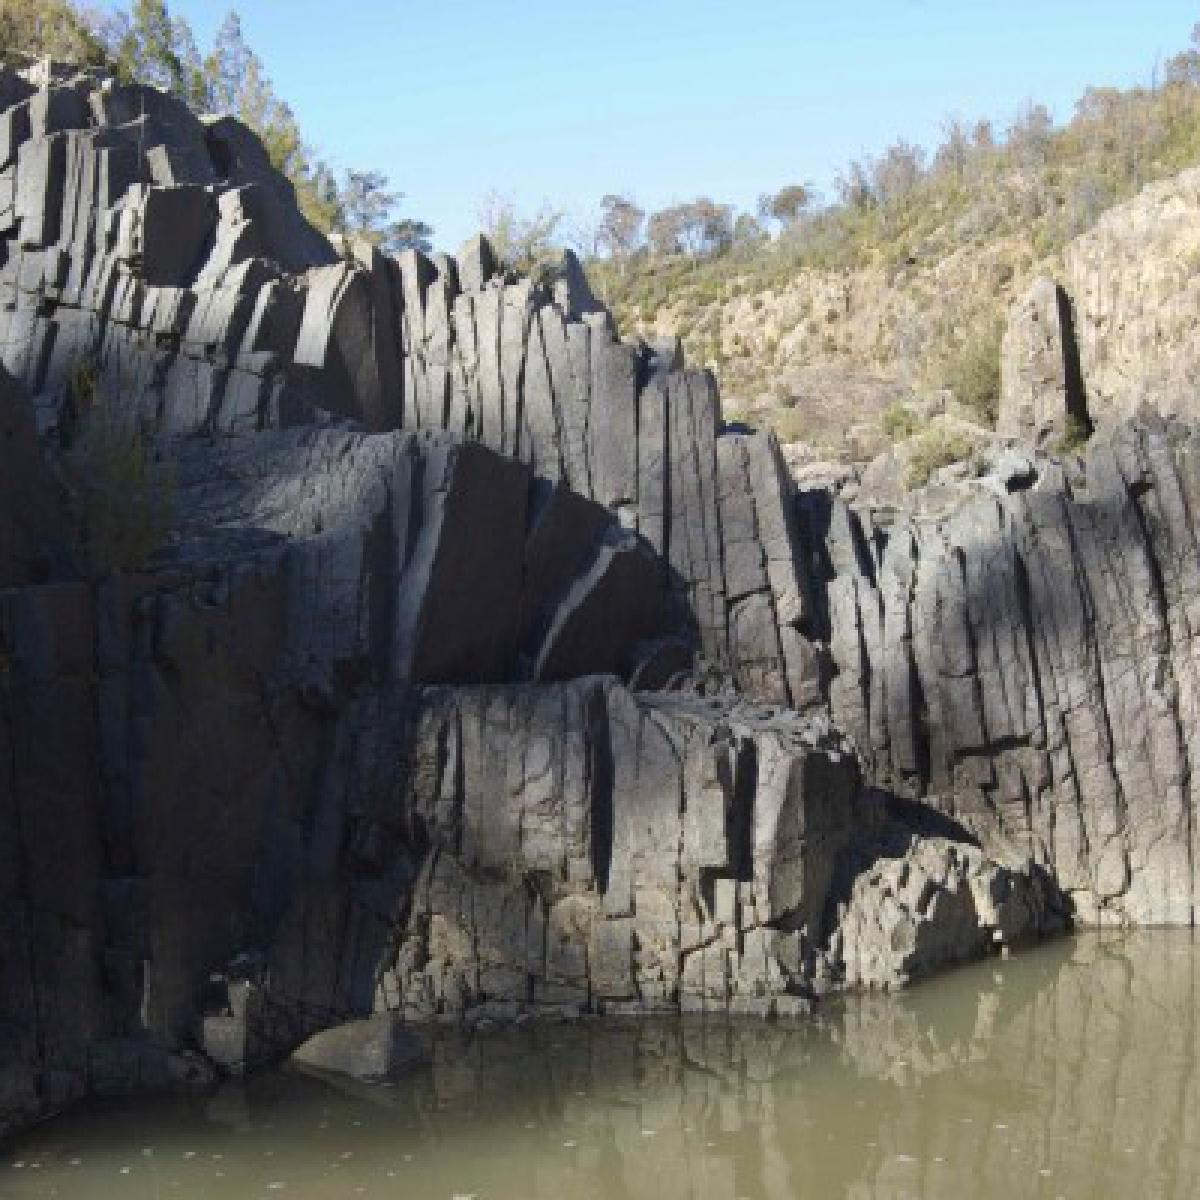 010 Basalt columns